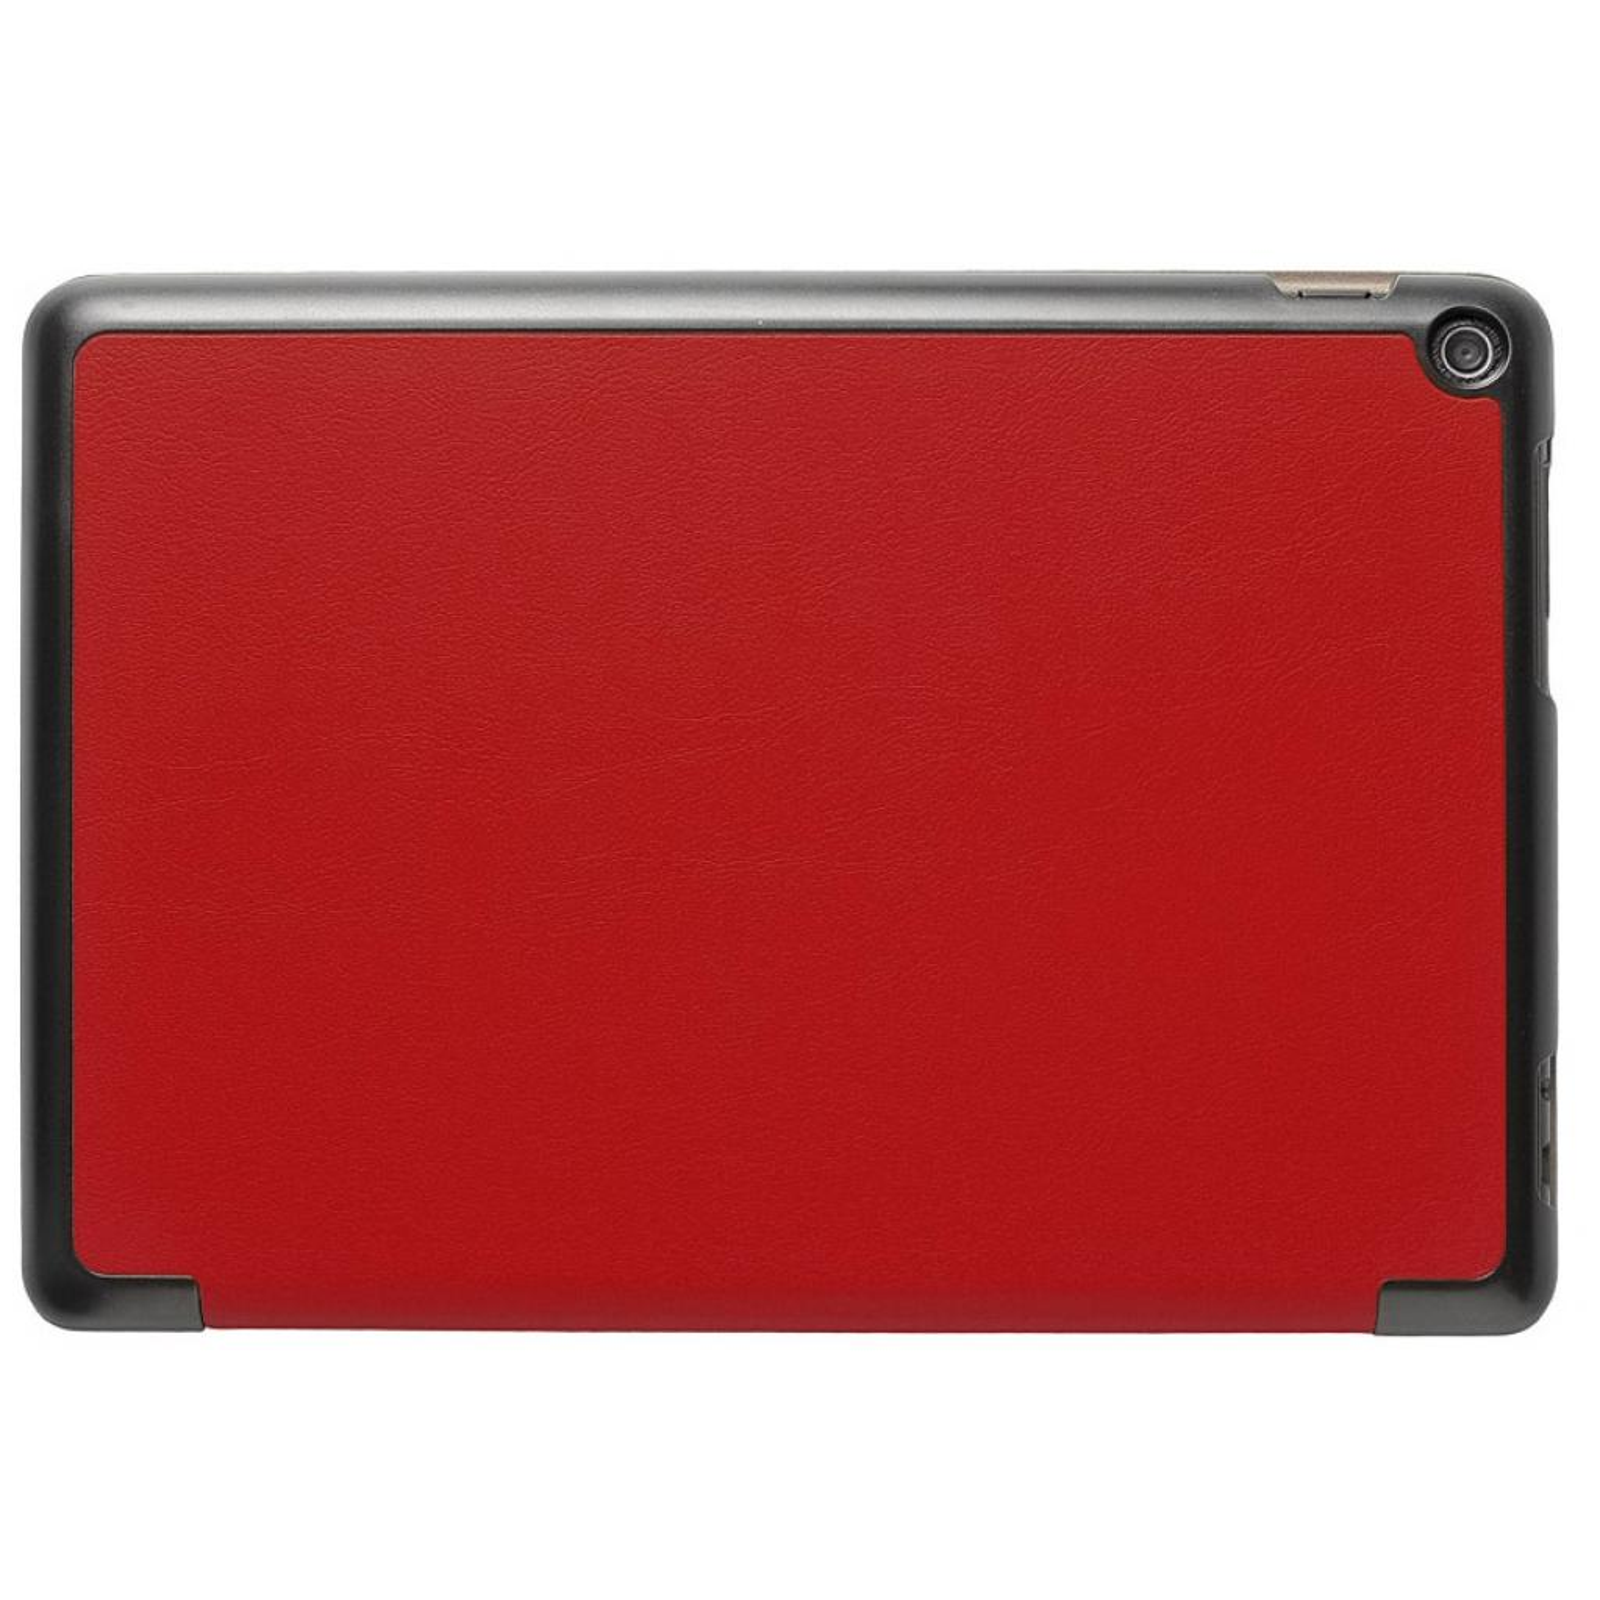 Чехол для планшета Grand-X ASUS ZenPad 10 Z300/Z300C Red (ATC - AZPZ300R) изображение 2